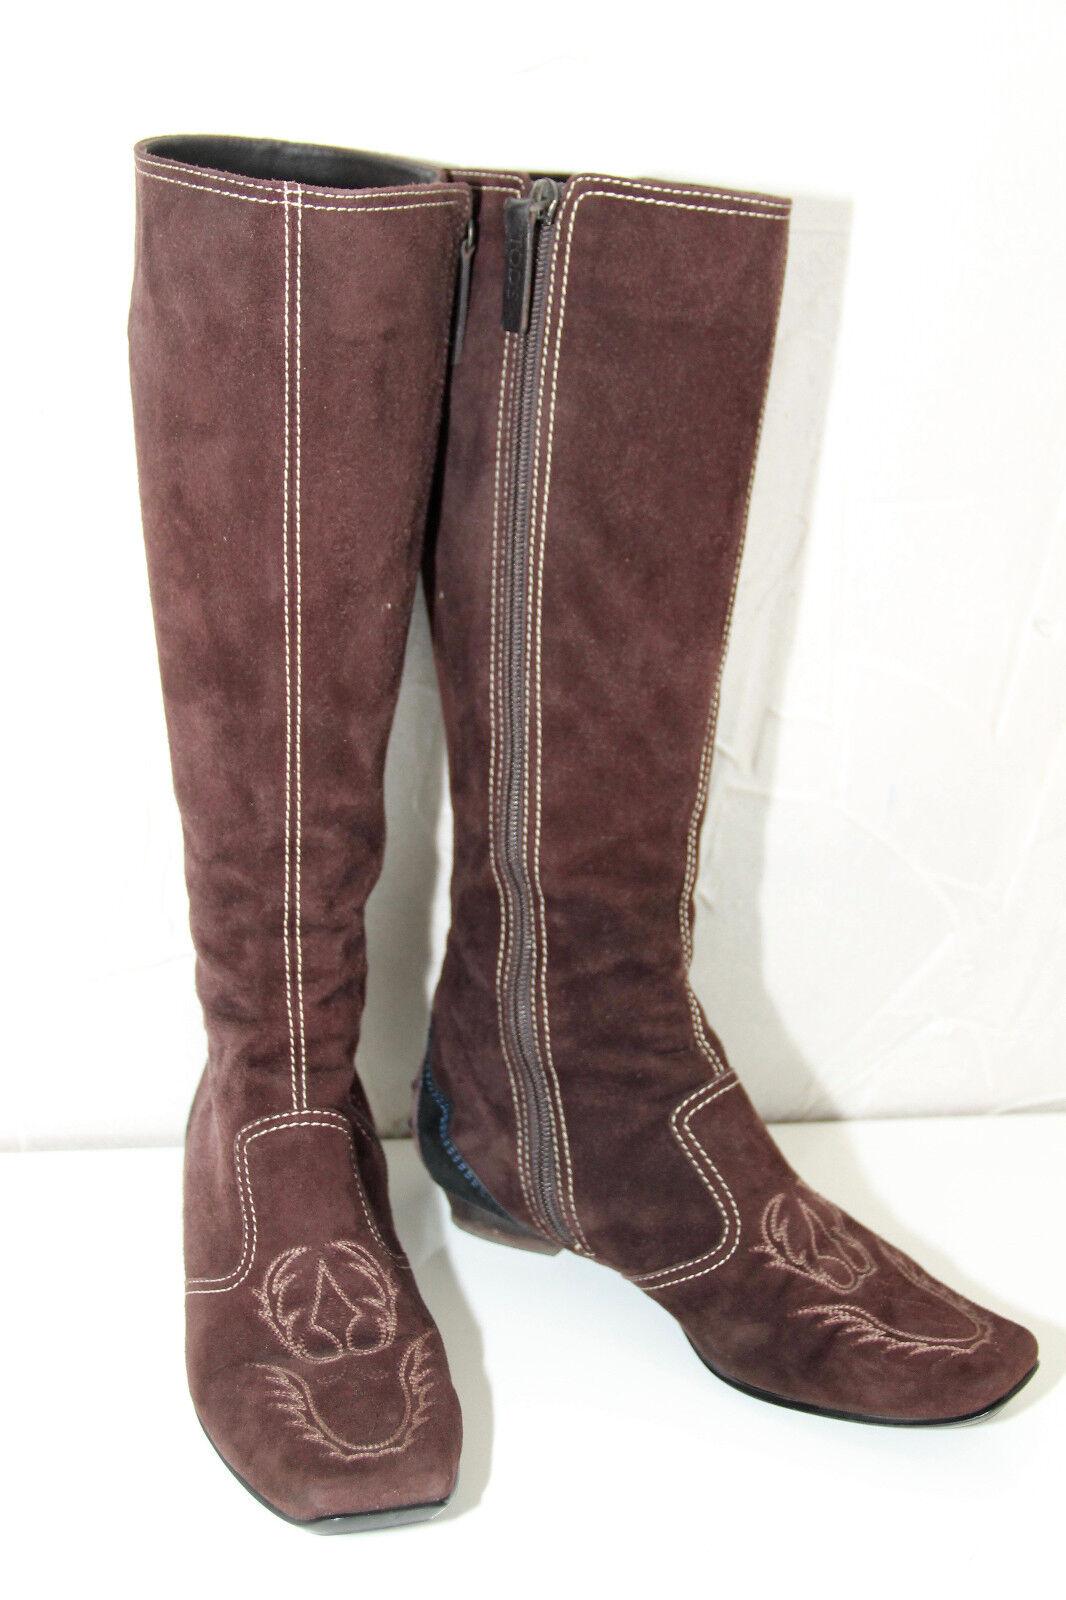 Grandes zapatos con descuento luxueuses bottes zippées en daim marron foncé TOD'S pointure 36 QUASI NEUVES